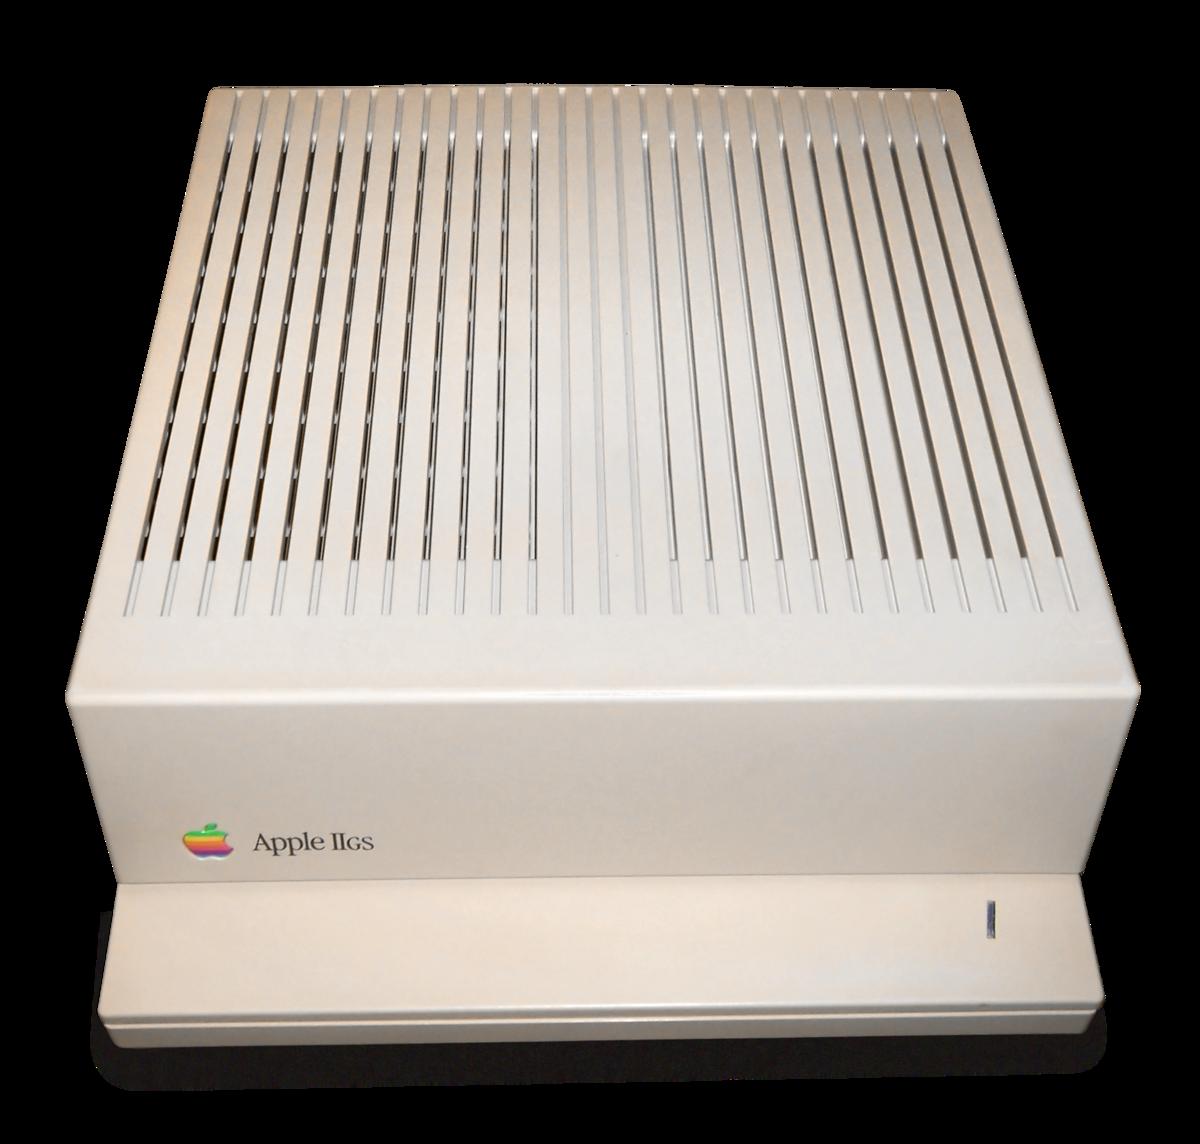 Apple IIGS - Wikipedia